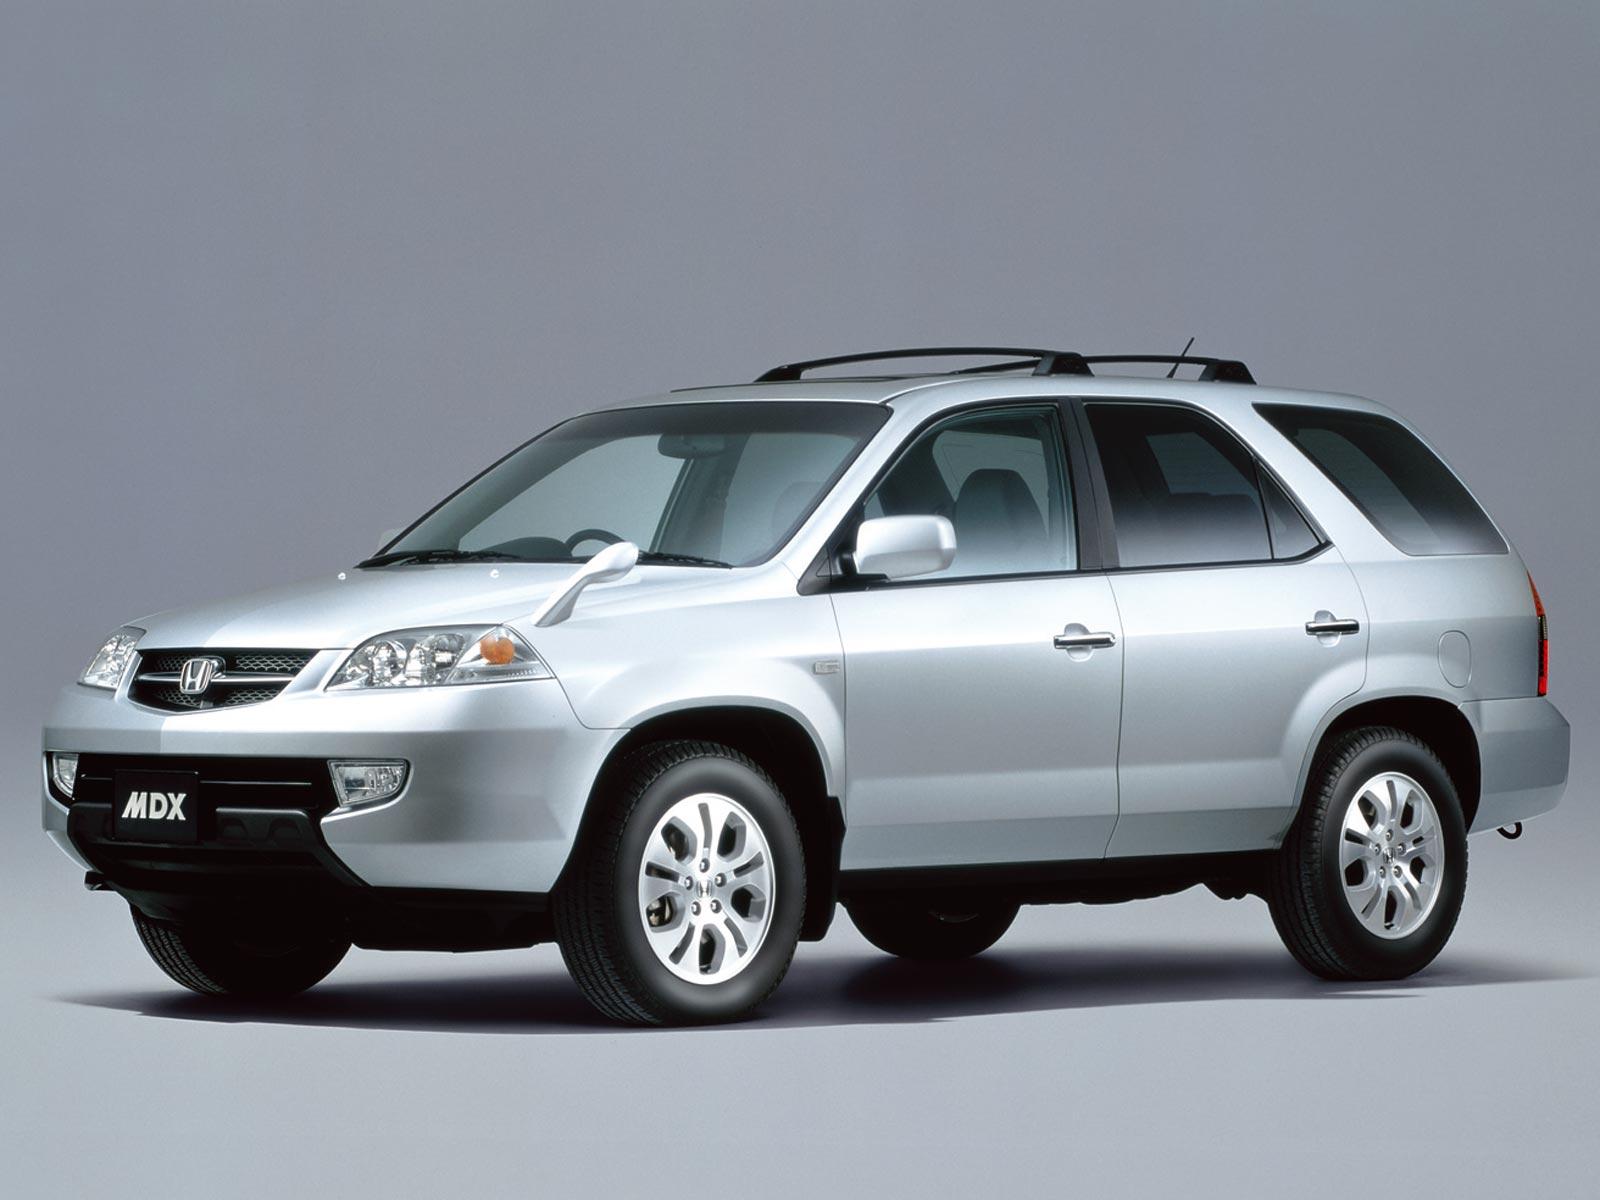 2003 Honda MDX (c) Honda